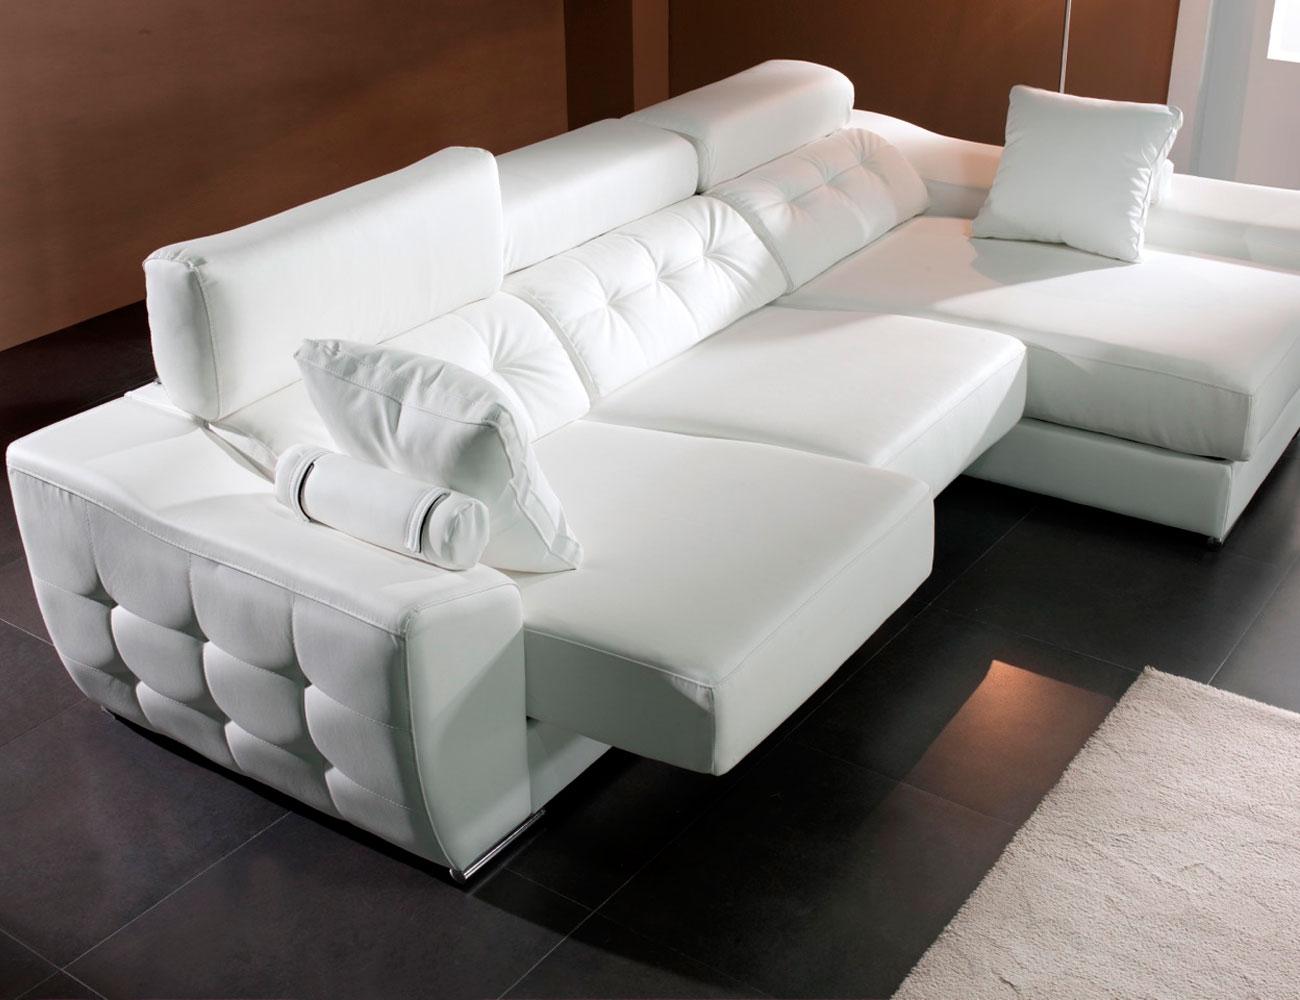 Sofa chaiselongue moderno capitone polipiel blanco34